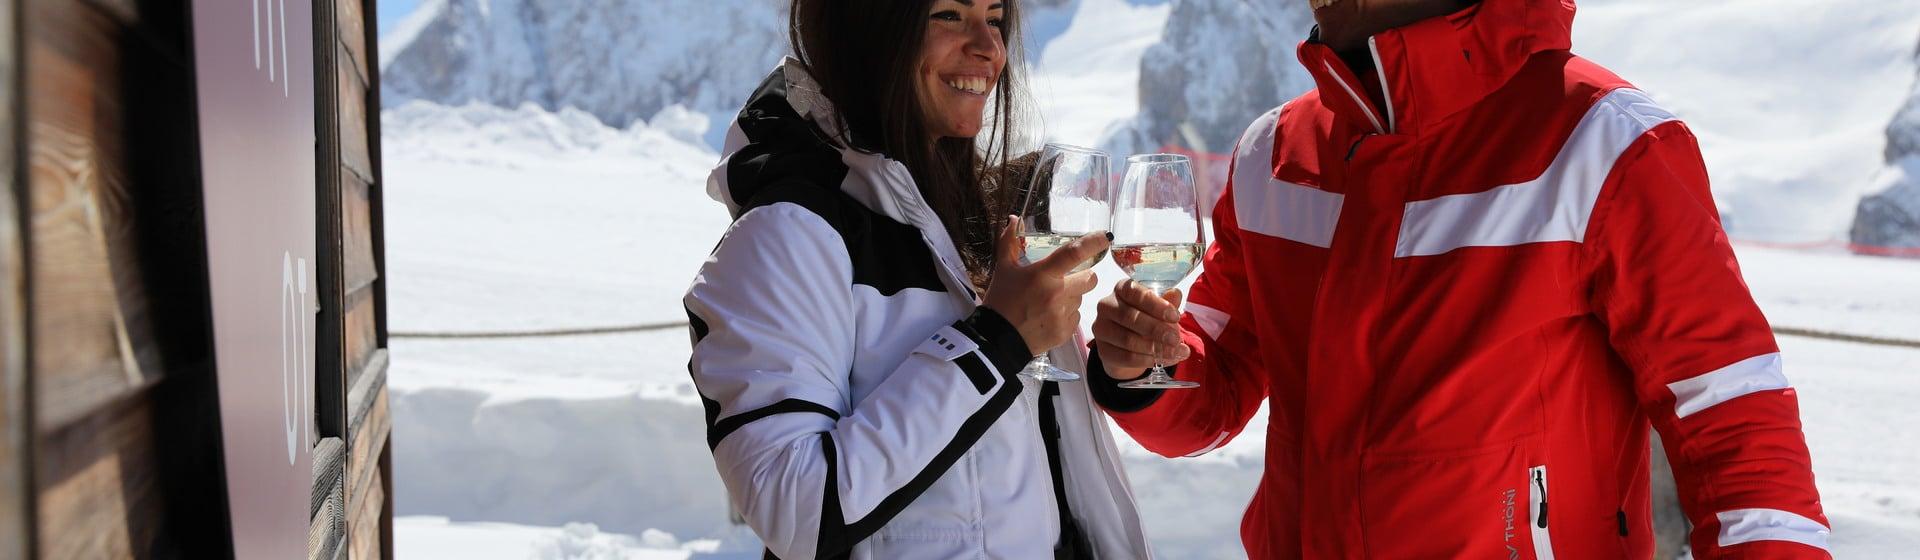 Third edition of Ski & Wine Arabba - Marmolada